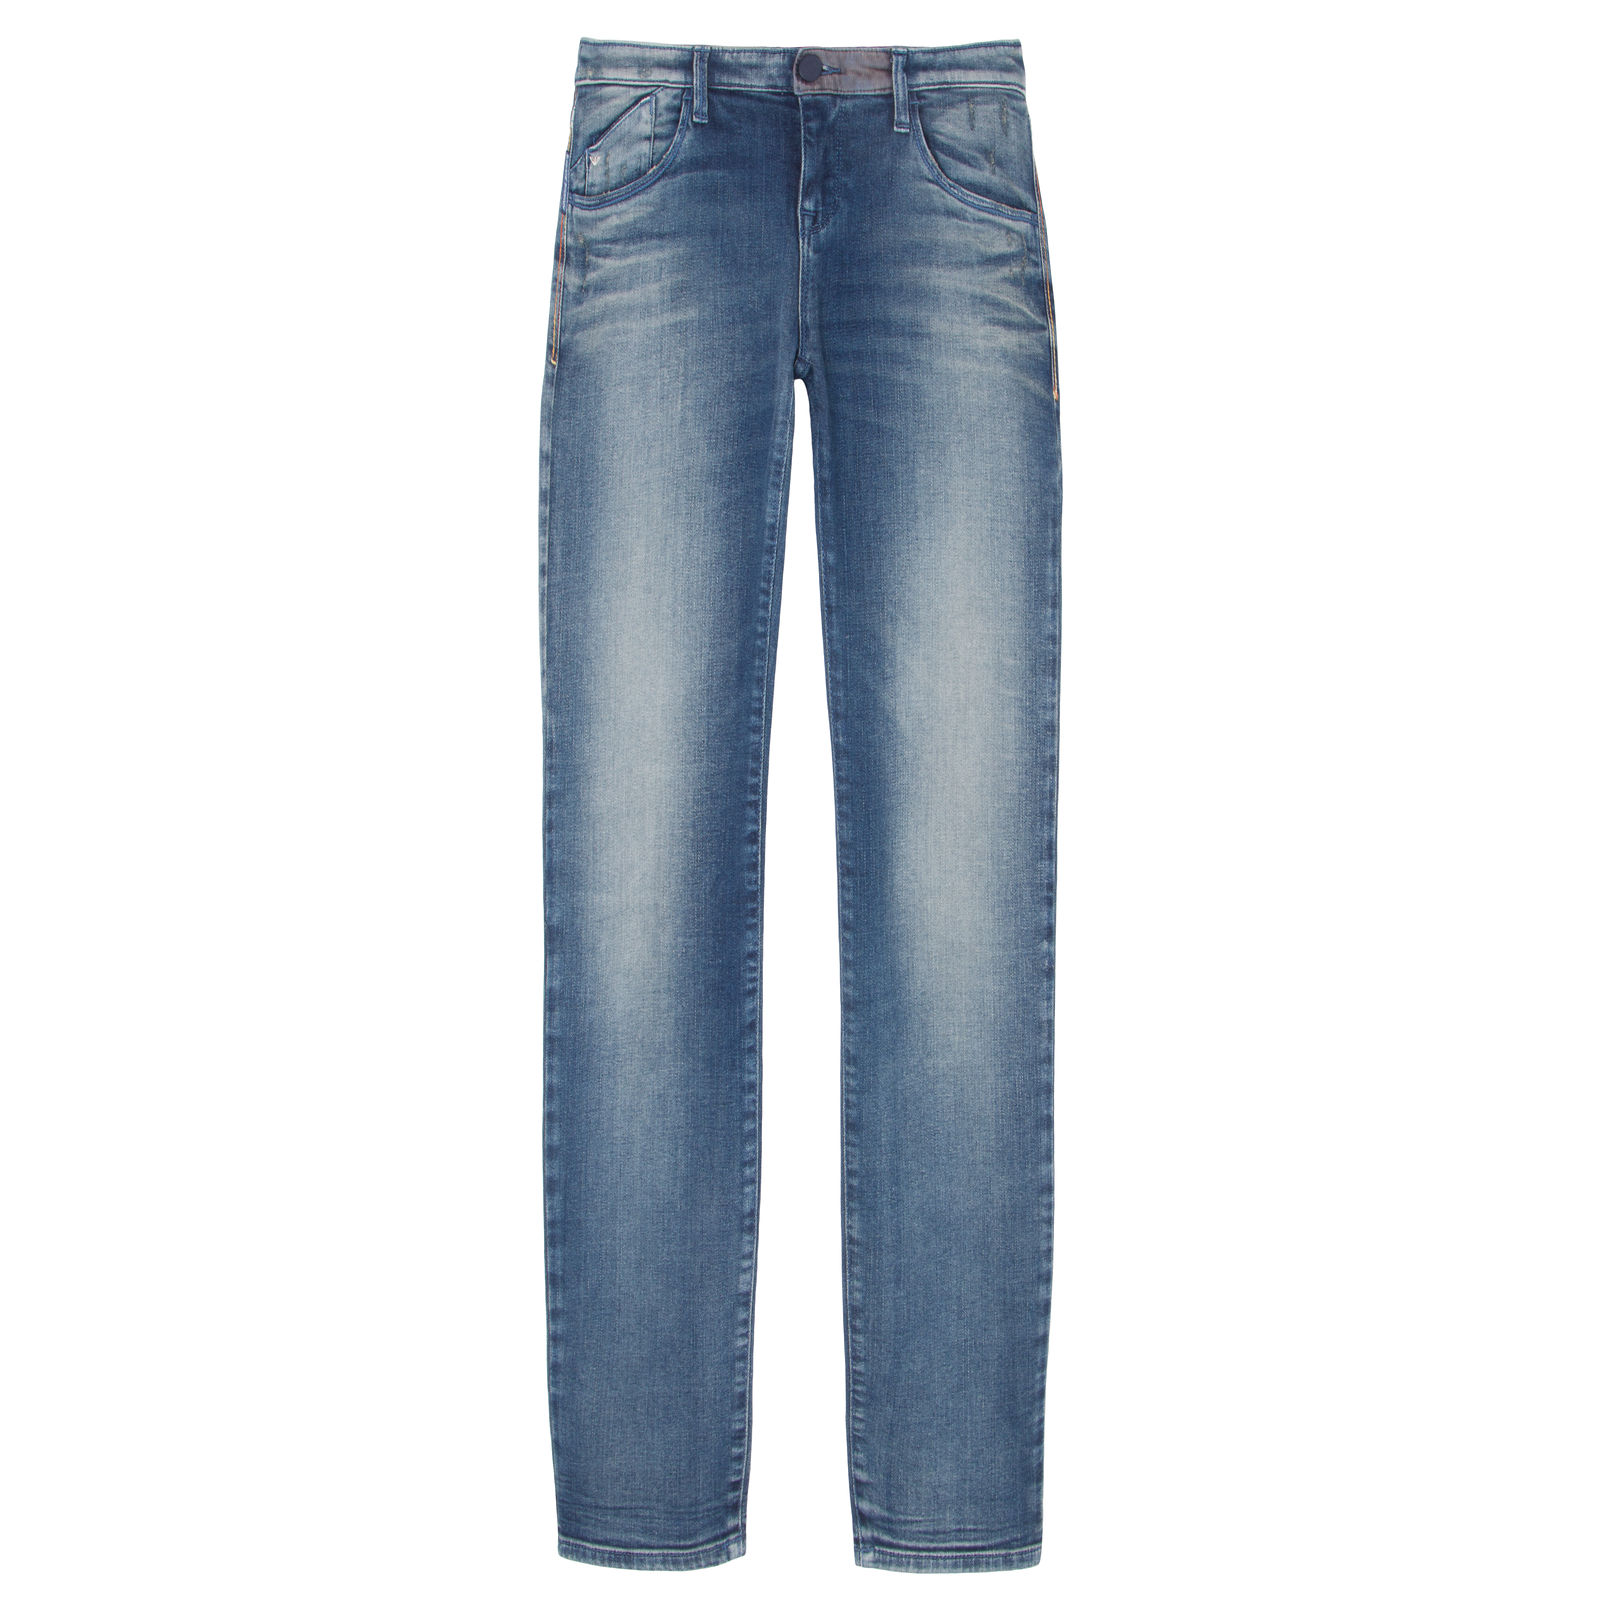 Calça Jeans Skinny Estonada Armani Jeans